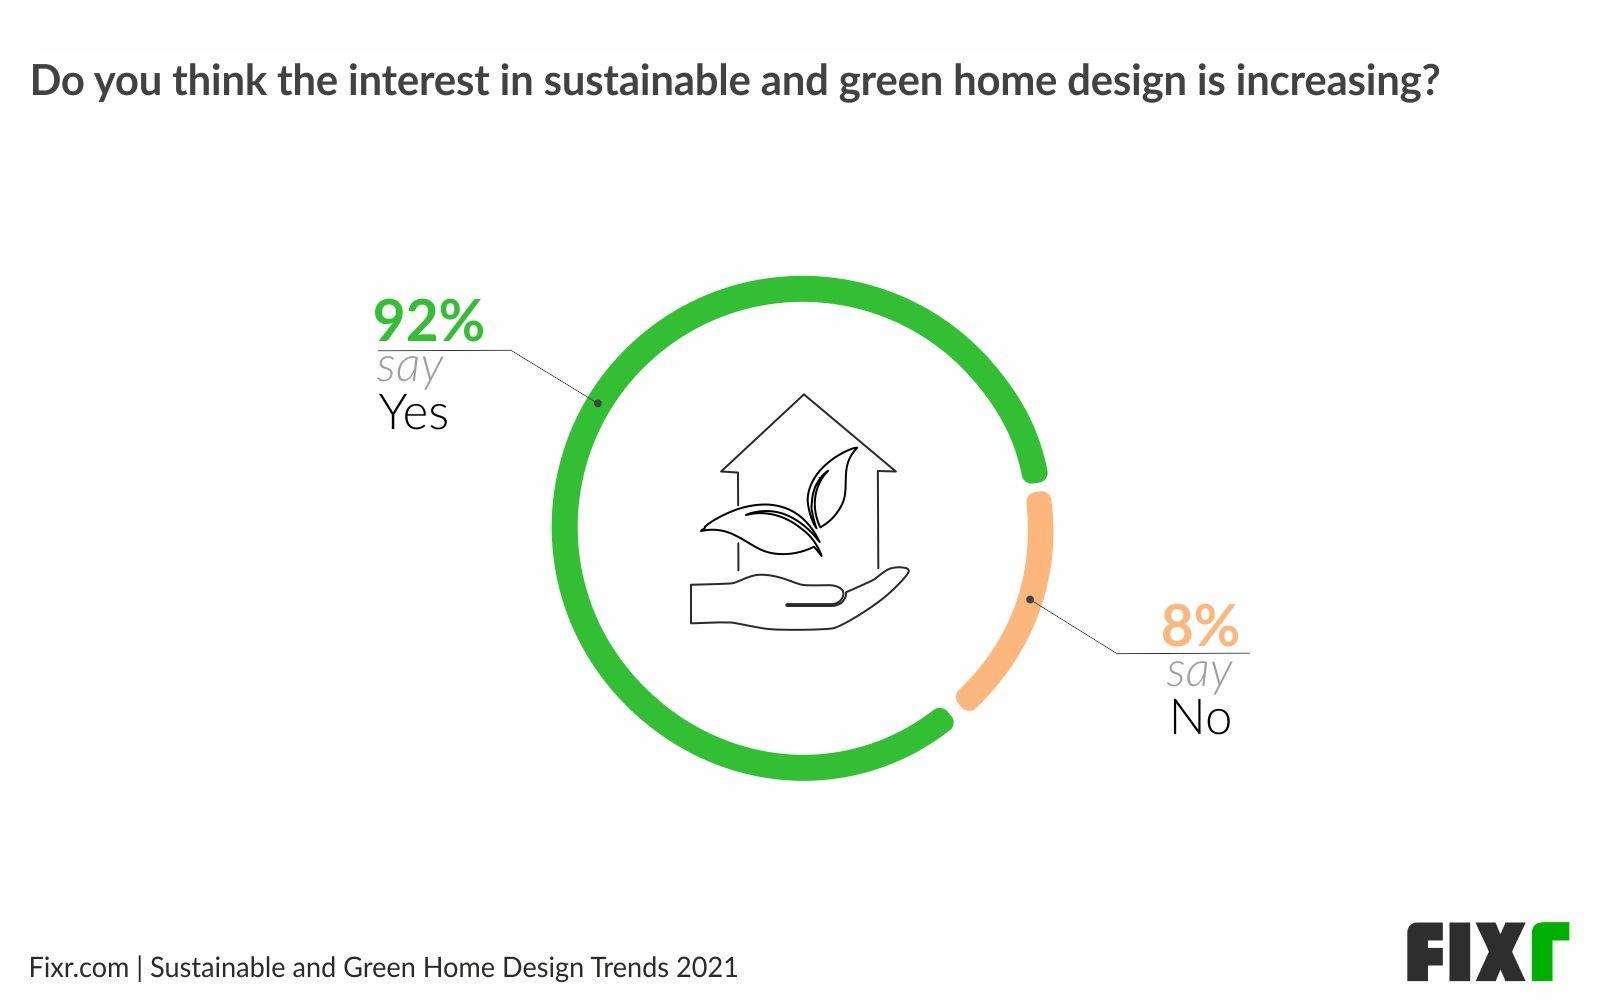 Interest in Green Home Design is Increasing in 2021